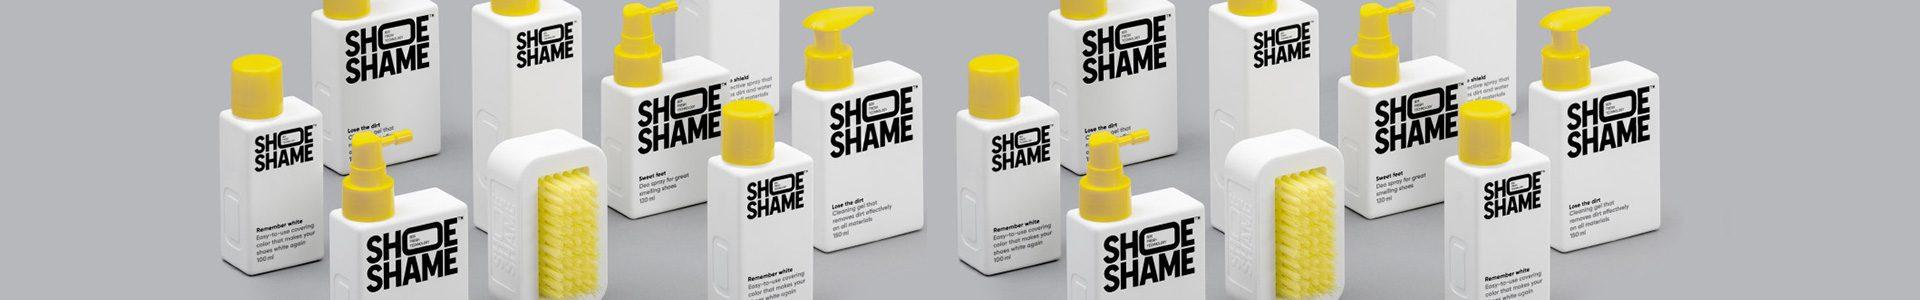 shoeshame-copertina